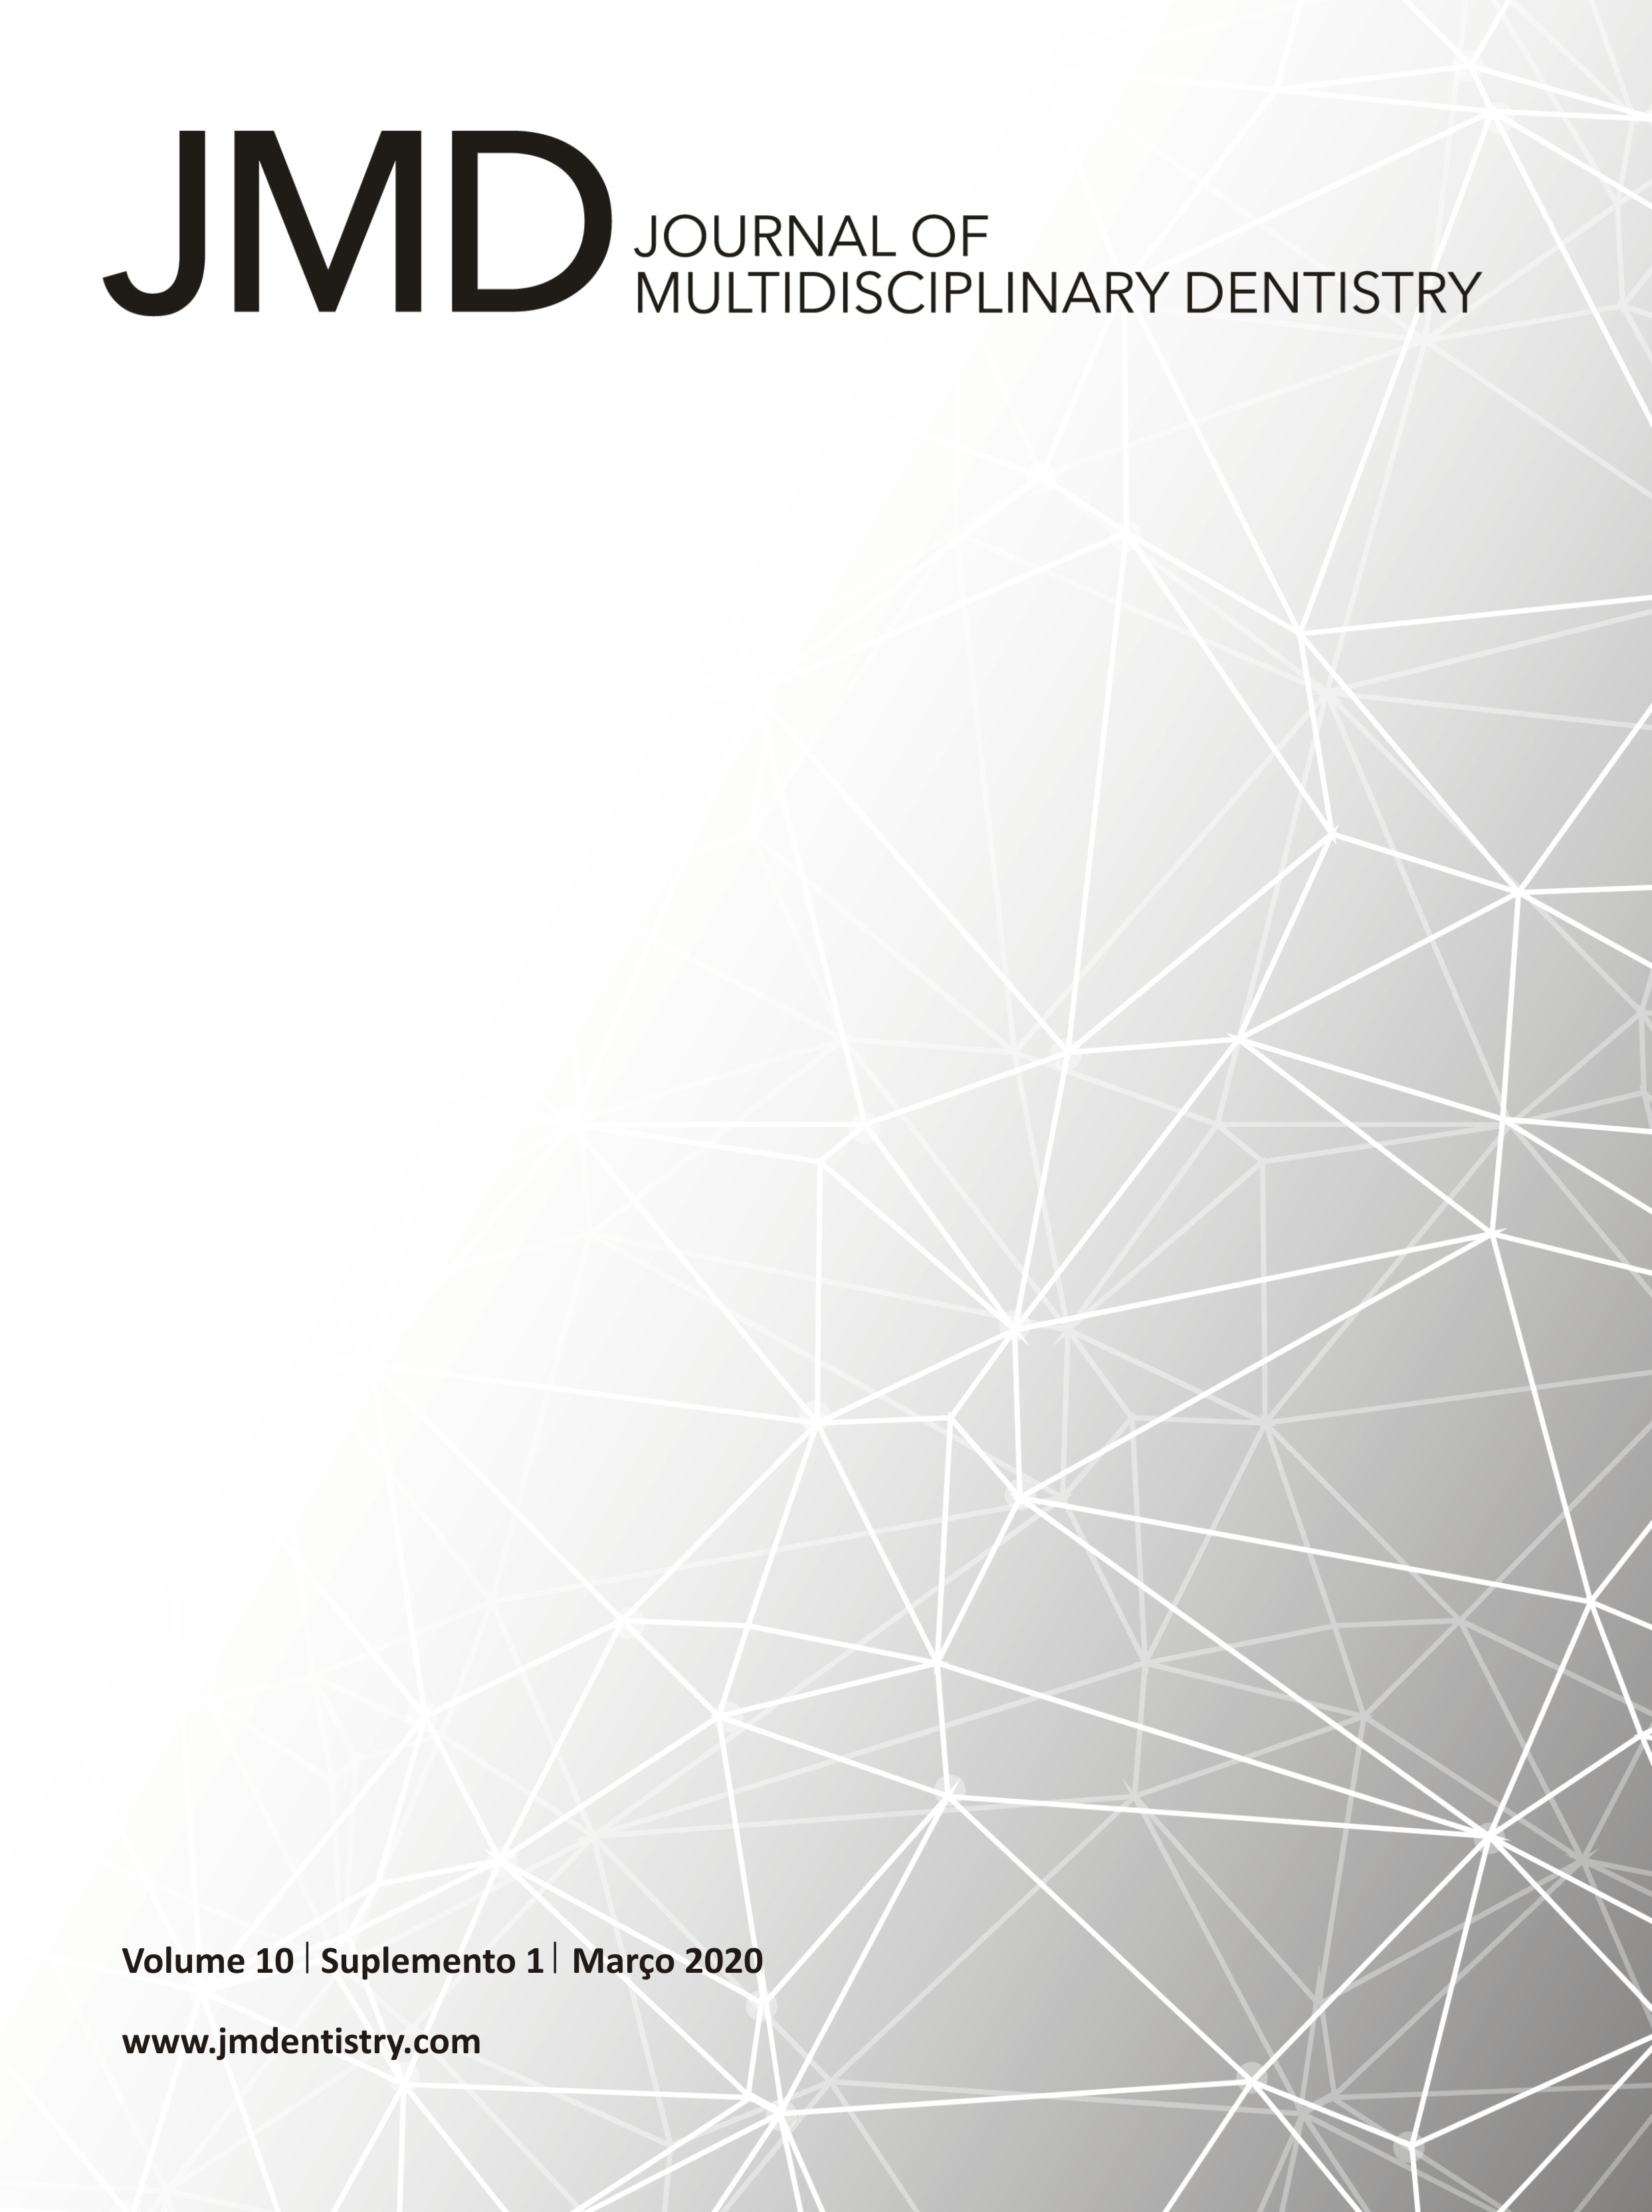 jmd_capa_v10_supl1_mar_2020